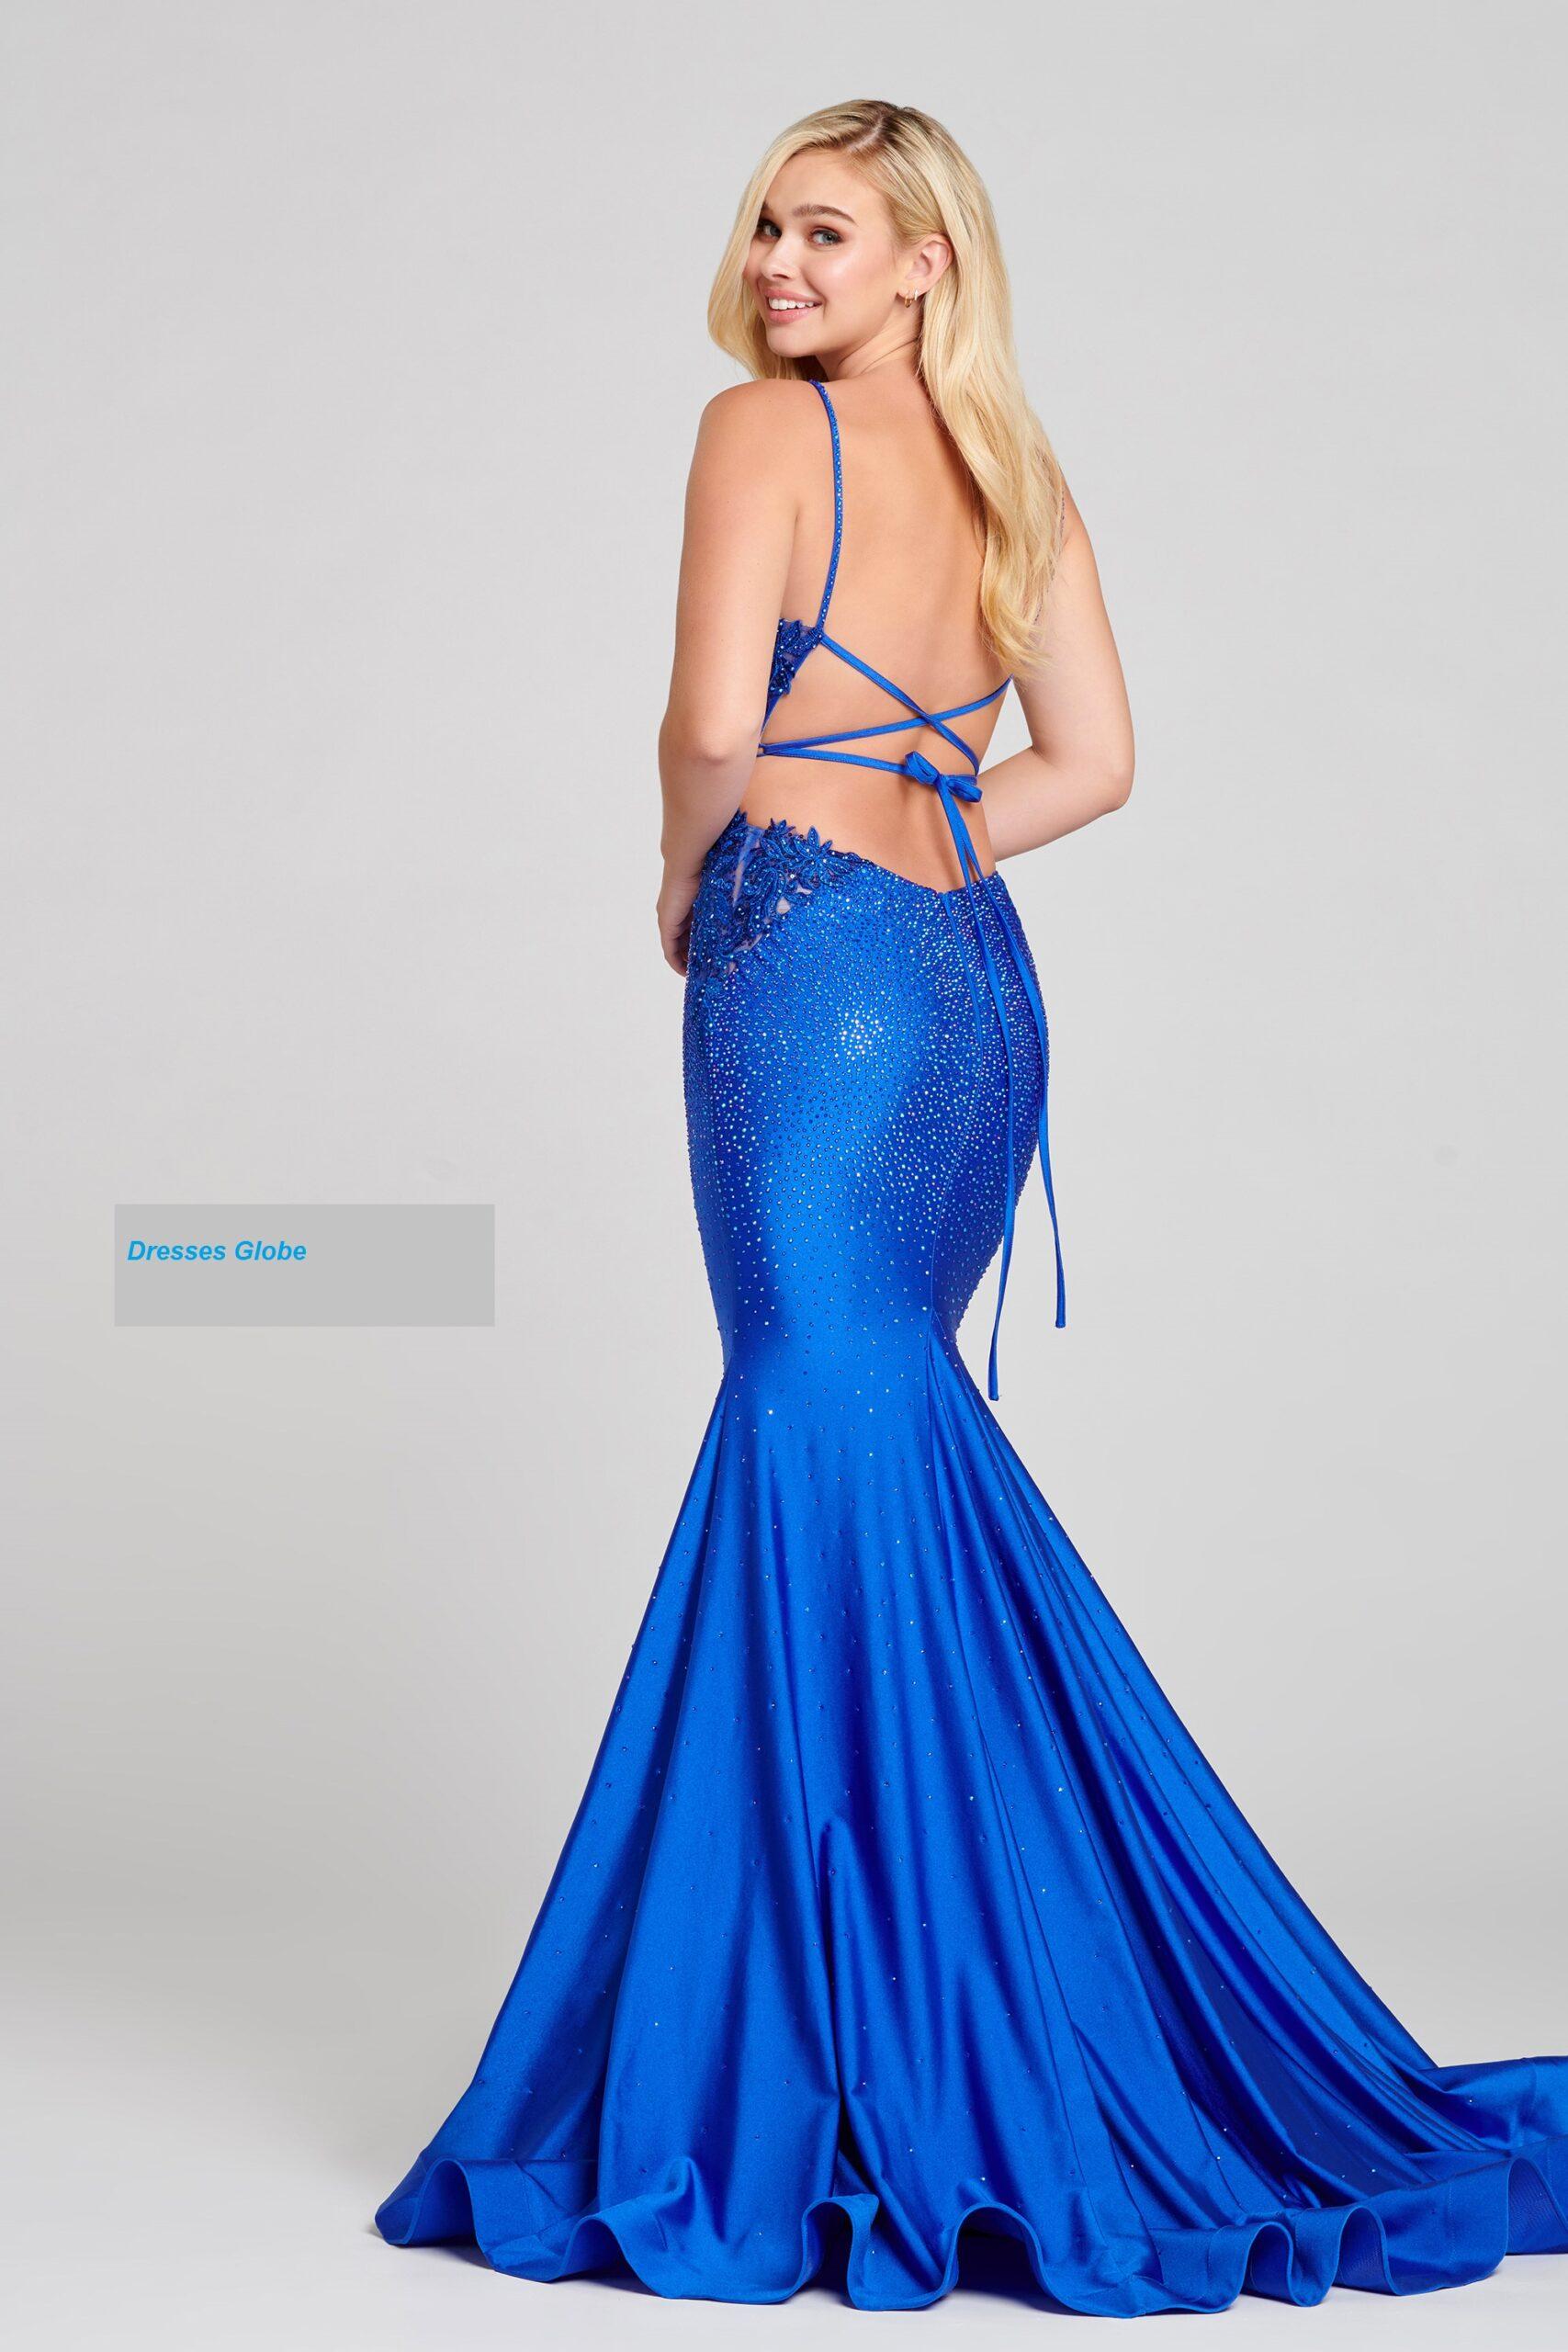 Blue Prom Dress V-neck style sleeveless back-side